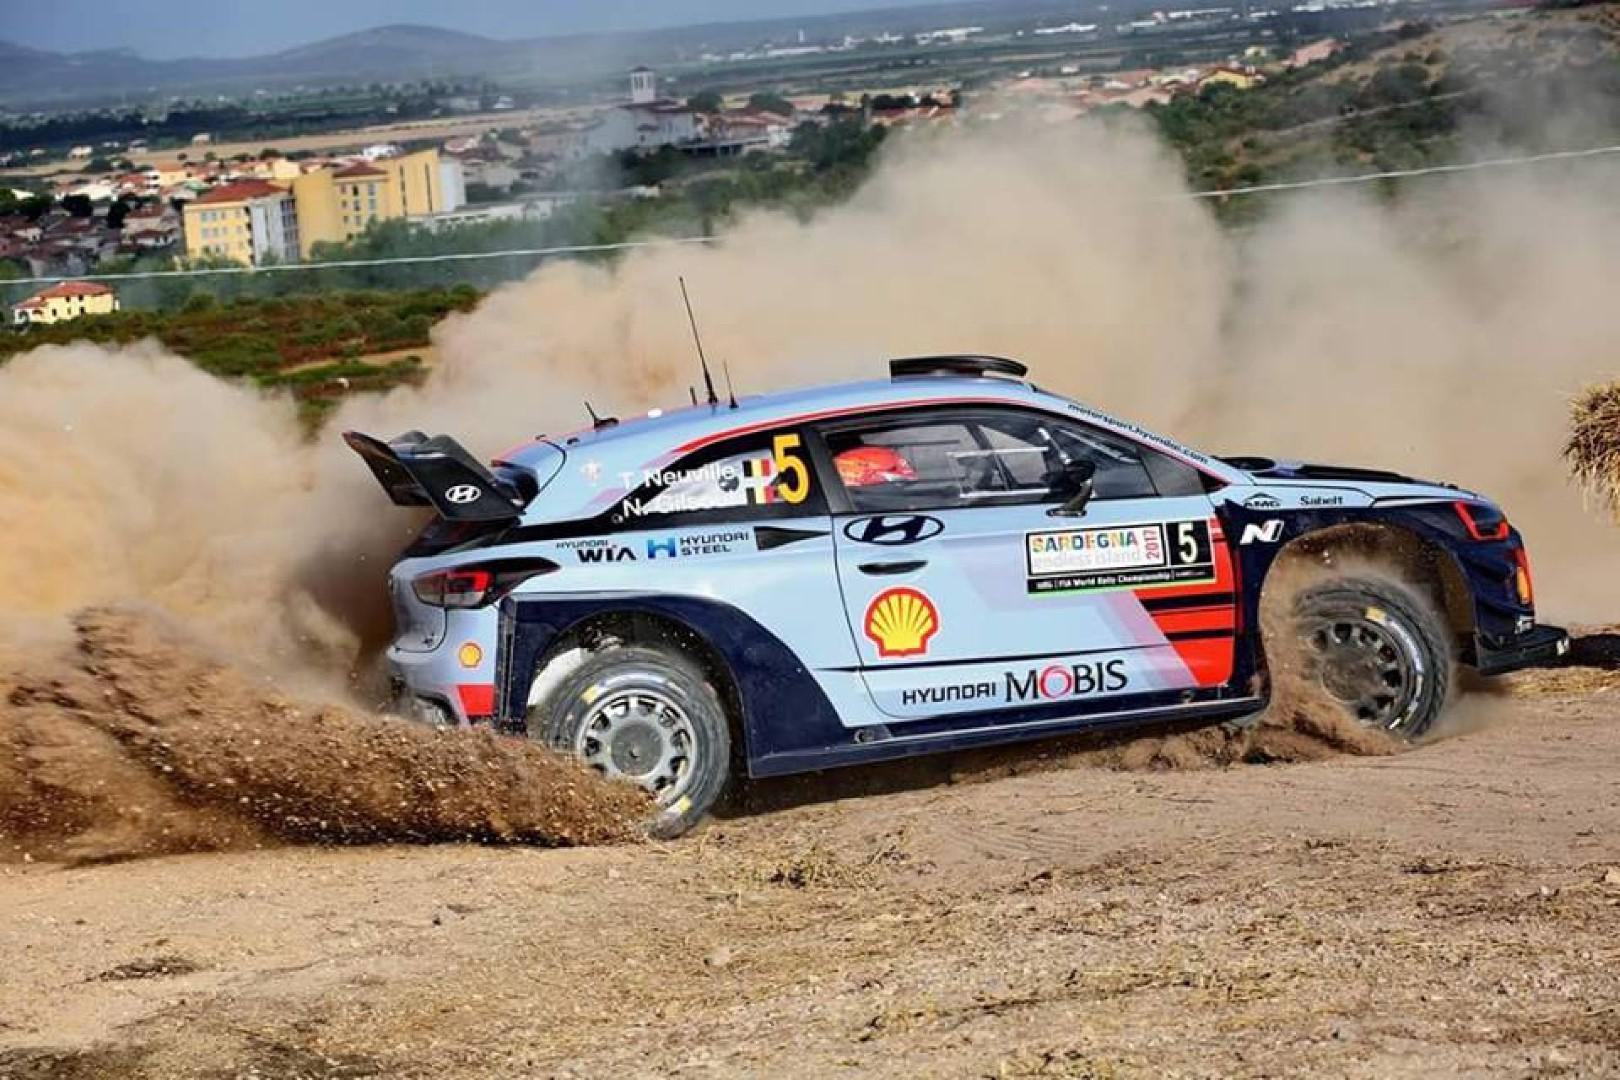 Rallye de Sardaigne : Neuville leader du rallye